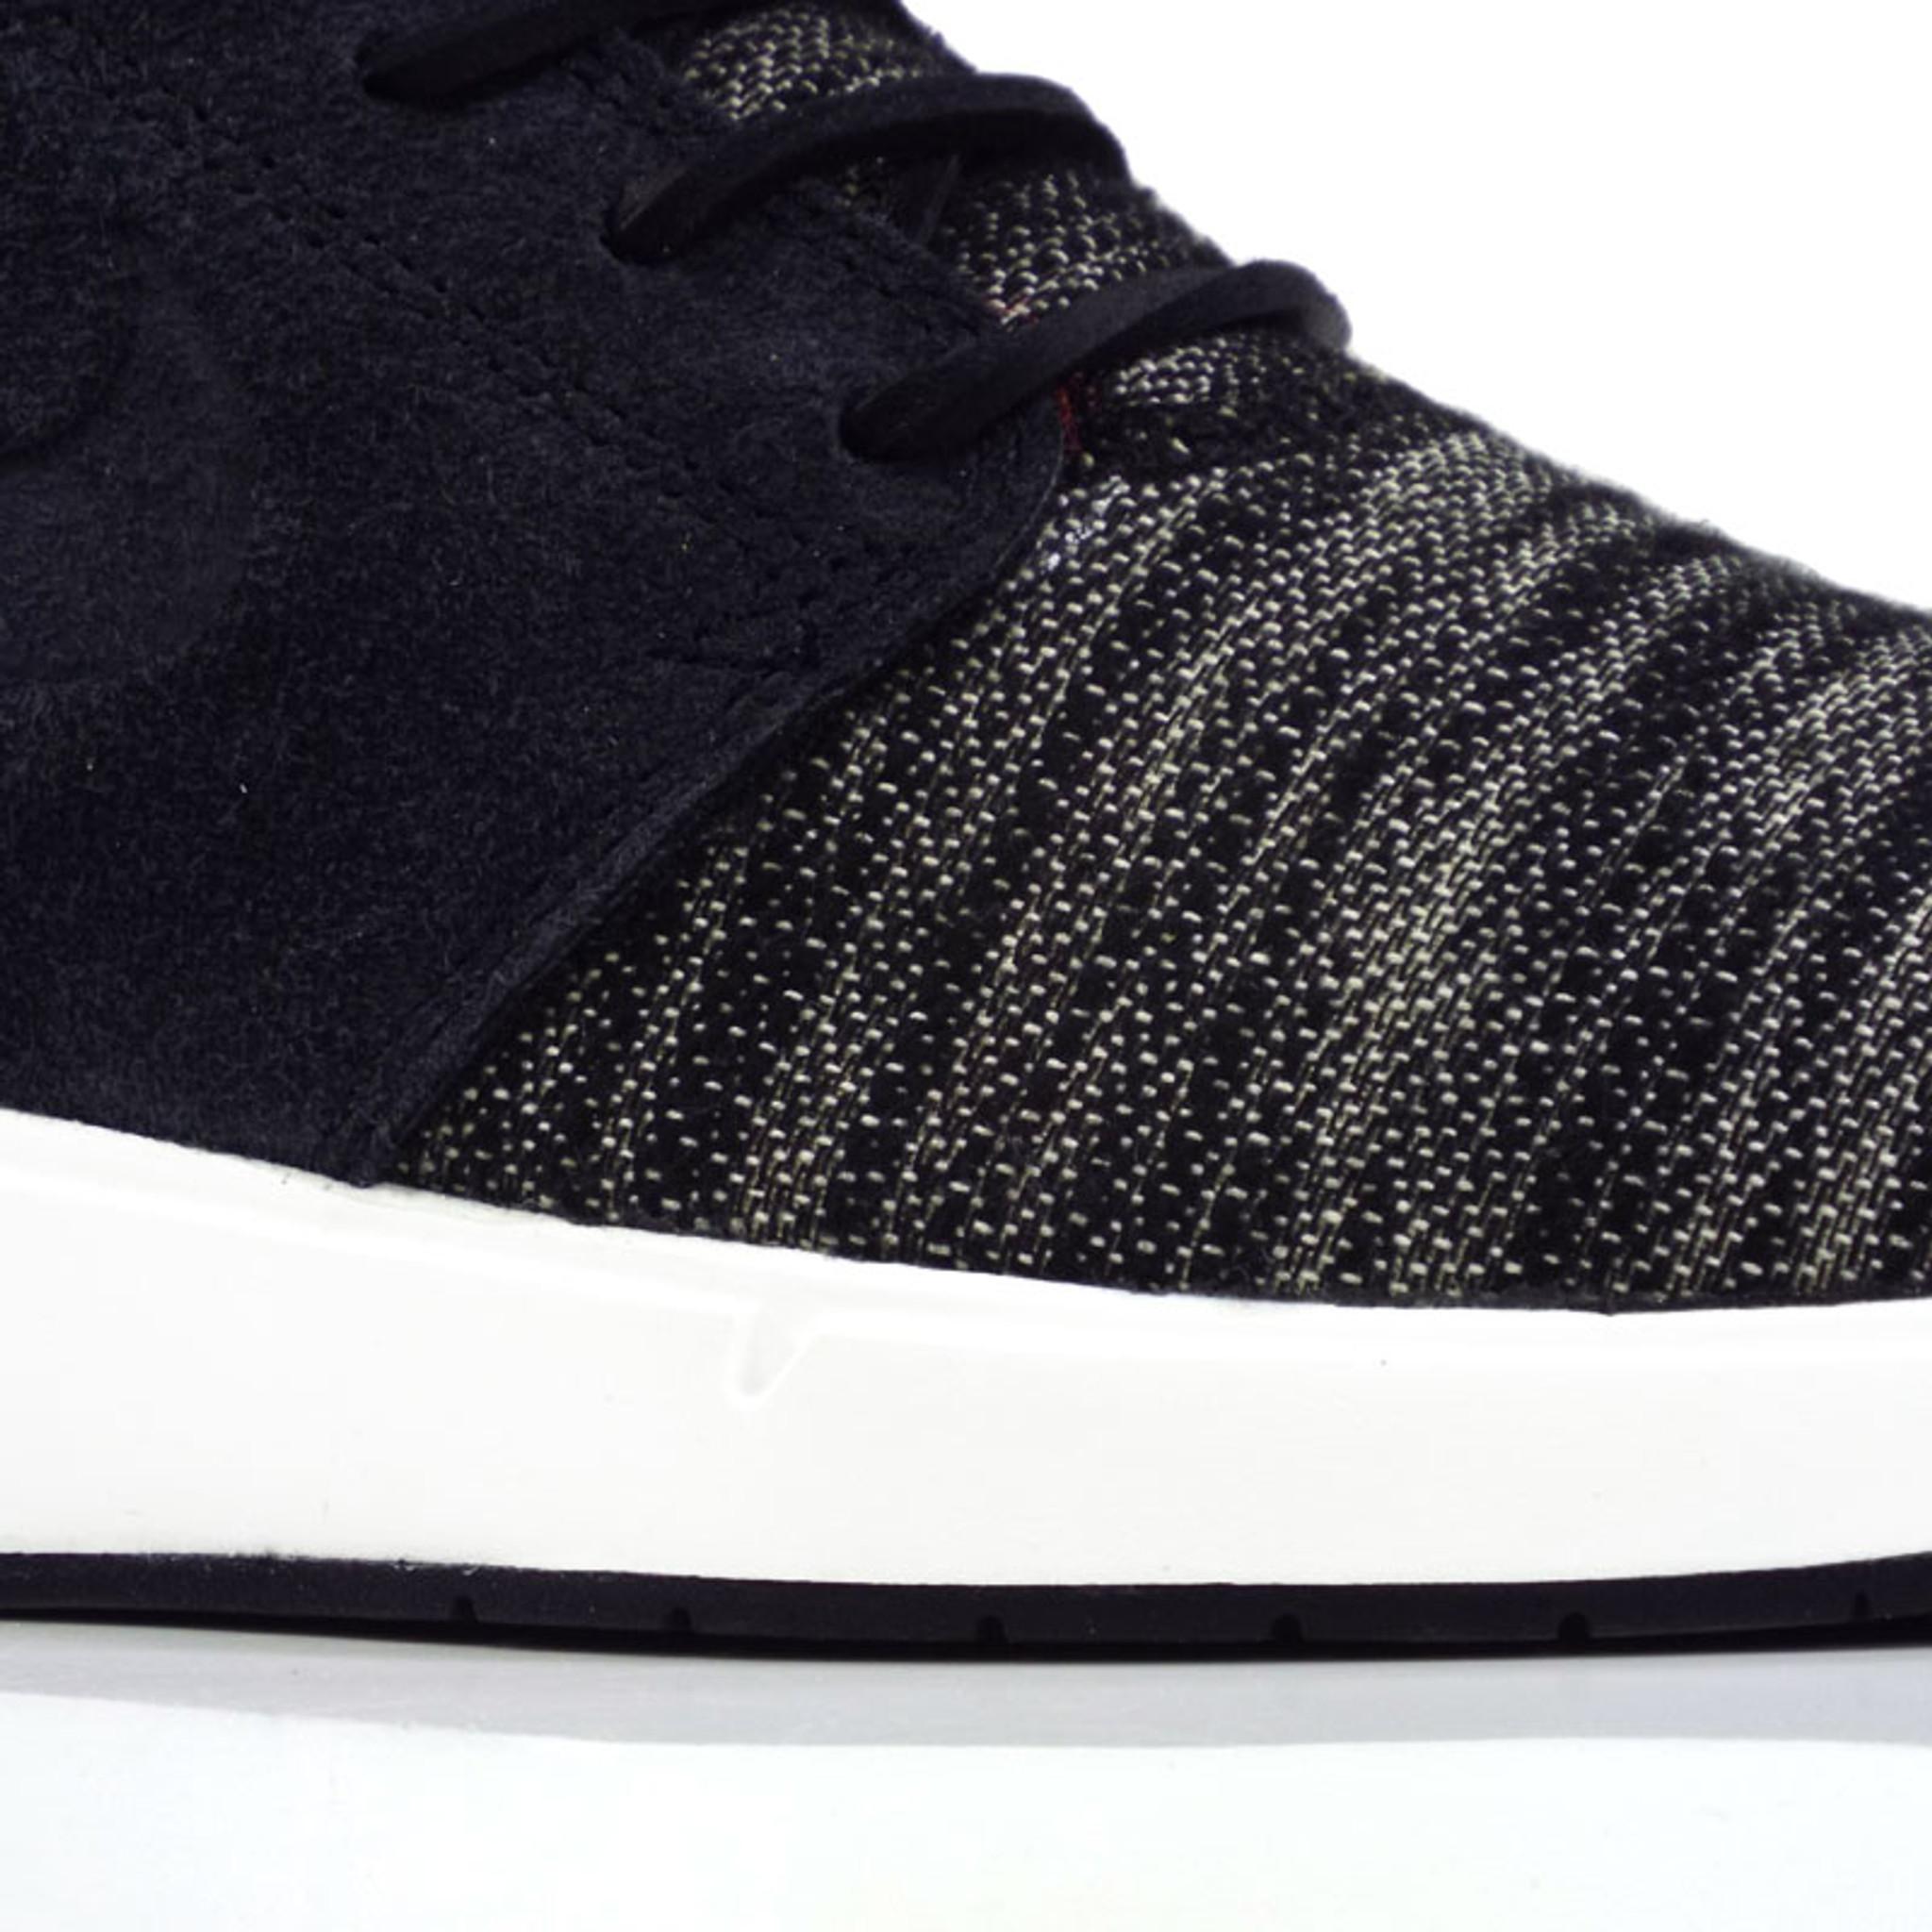 ganador el fin Uva  Nike SB Air Max Stefan Janoski 2 Premium Shoes - Black/Black-Summit White -  Detroit City Skateboards Co.